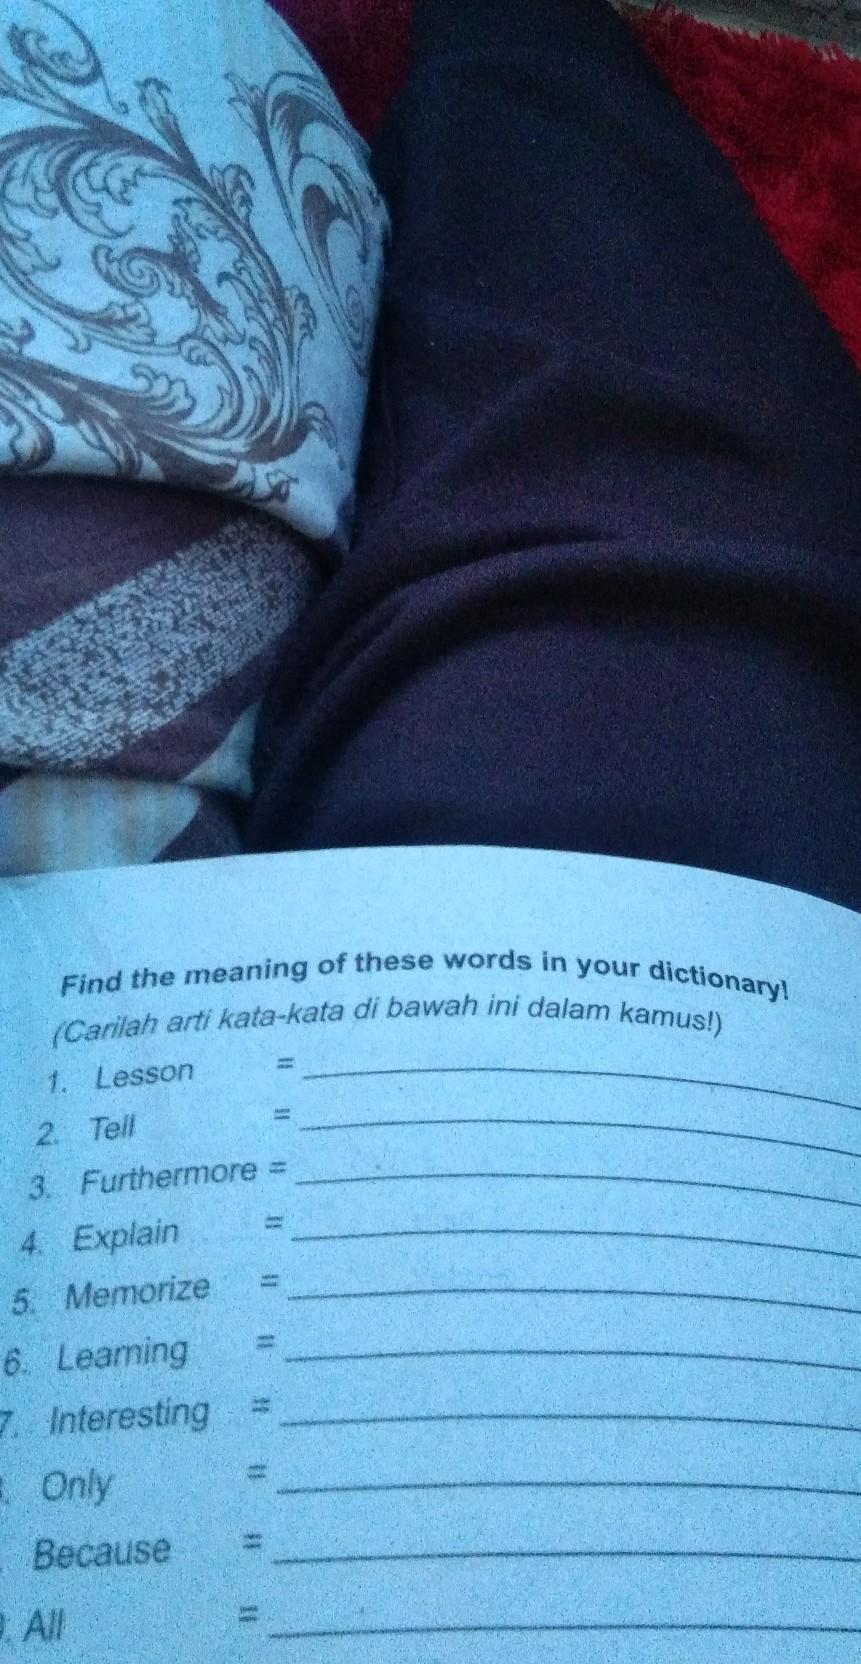 Arti Kata Only : Carilah, Kata-kata, Bawah, Dalam, Kamus!)neaning, These, Words, Dictionary!1., Brainly.co.id